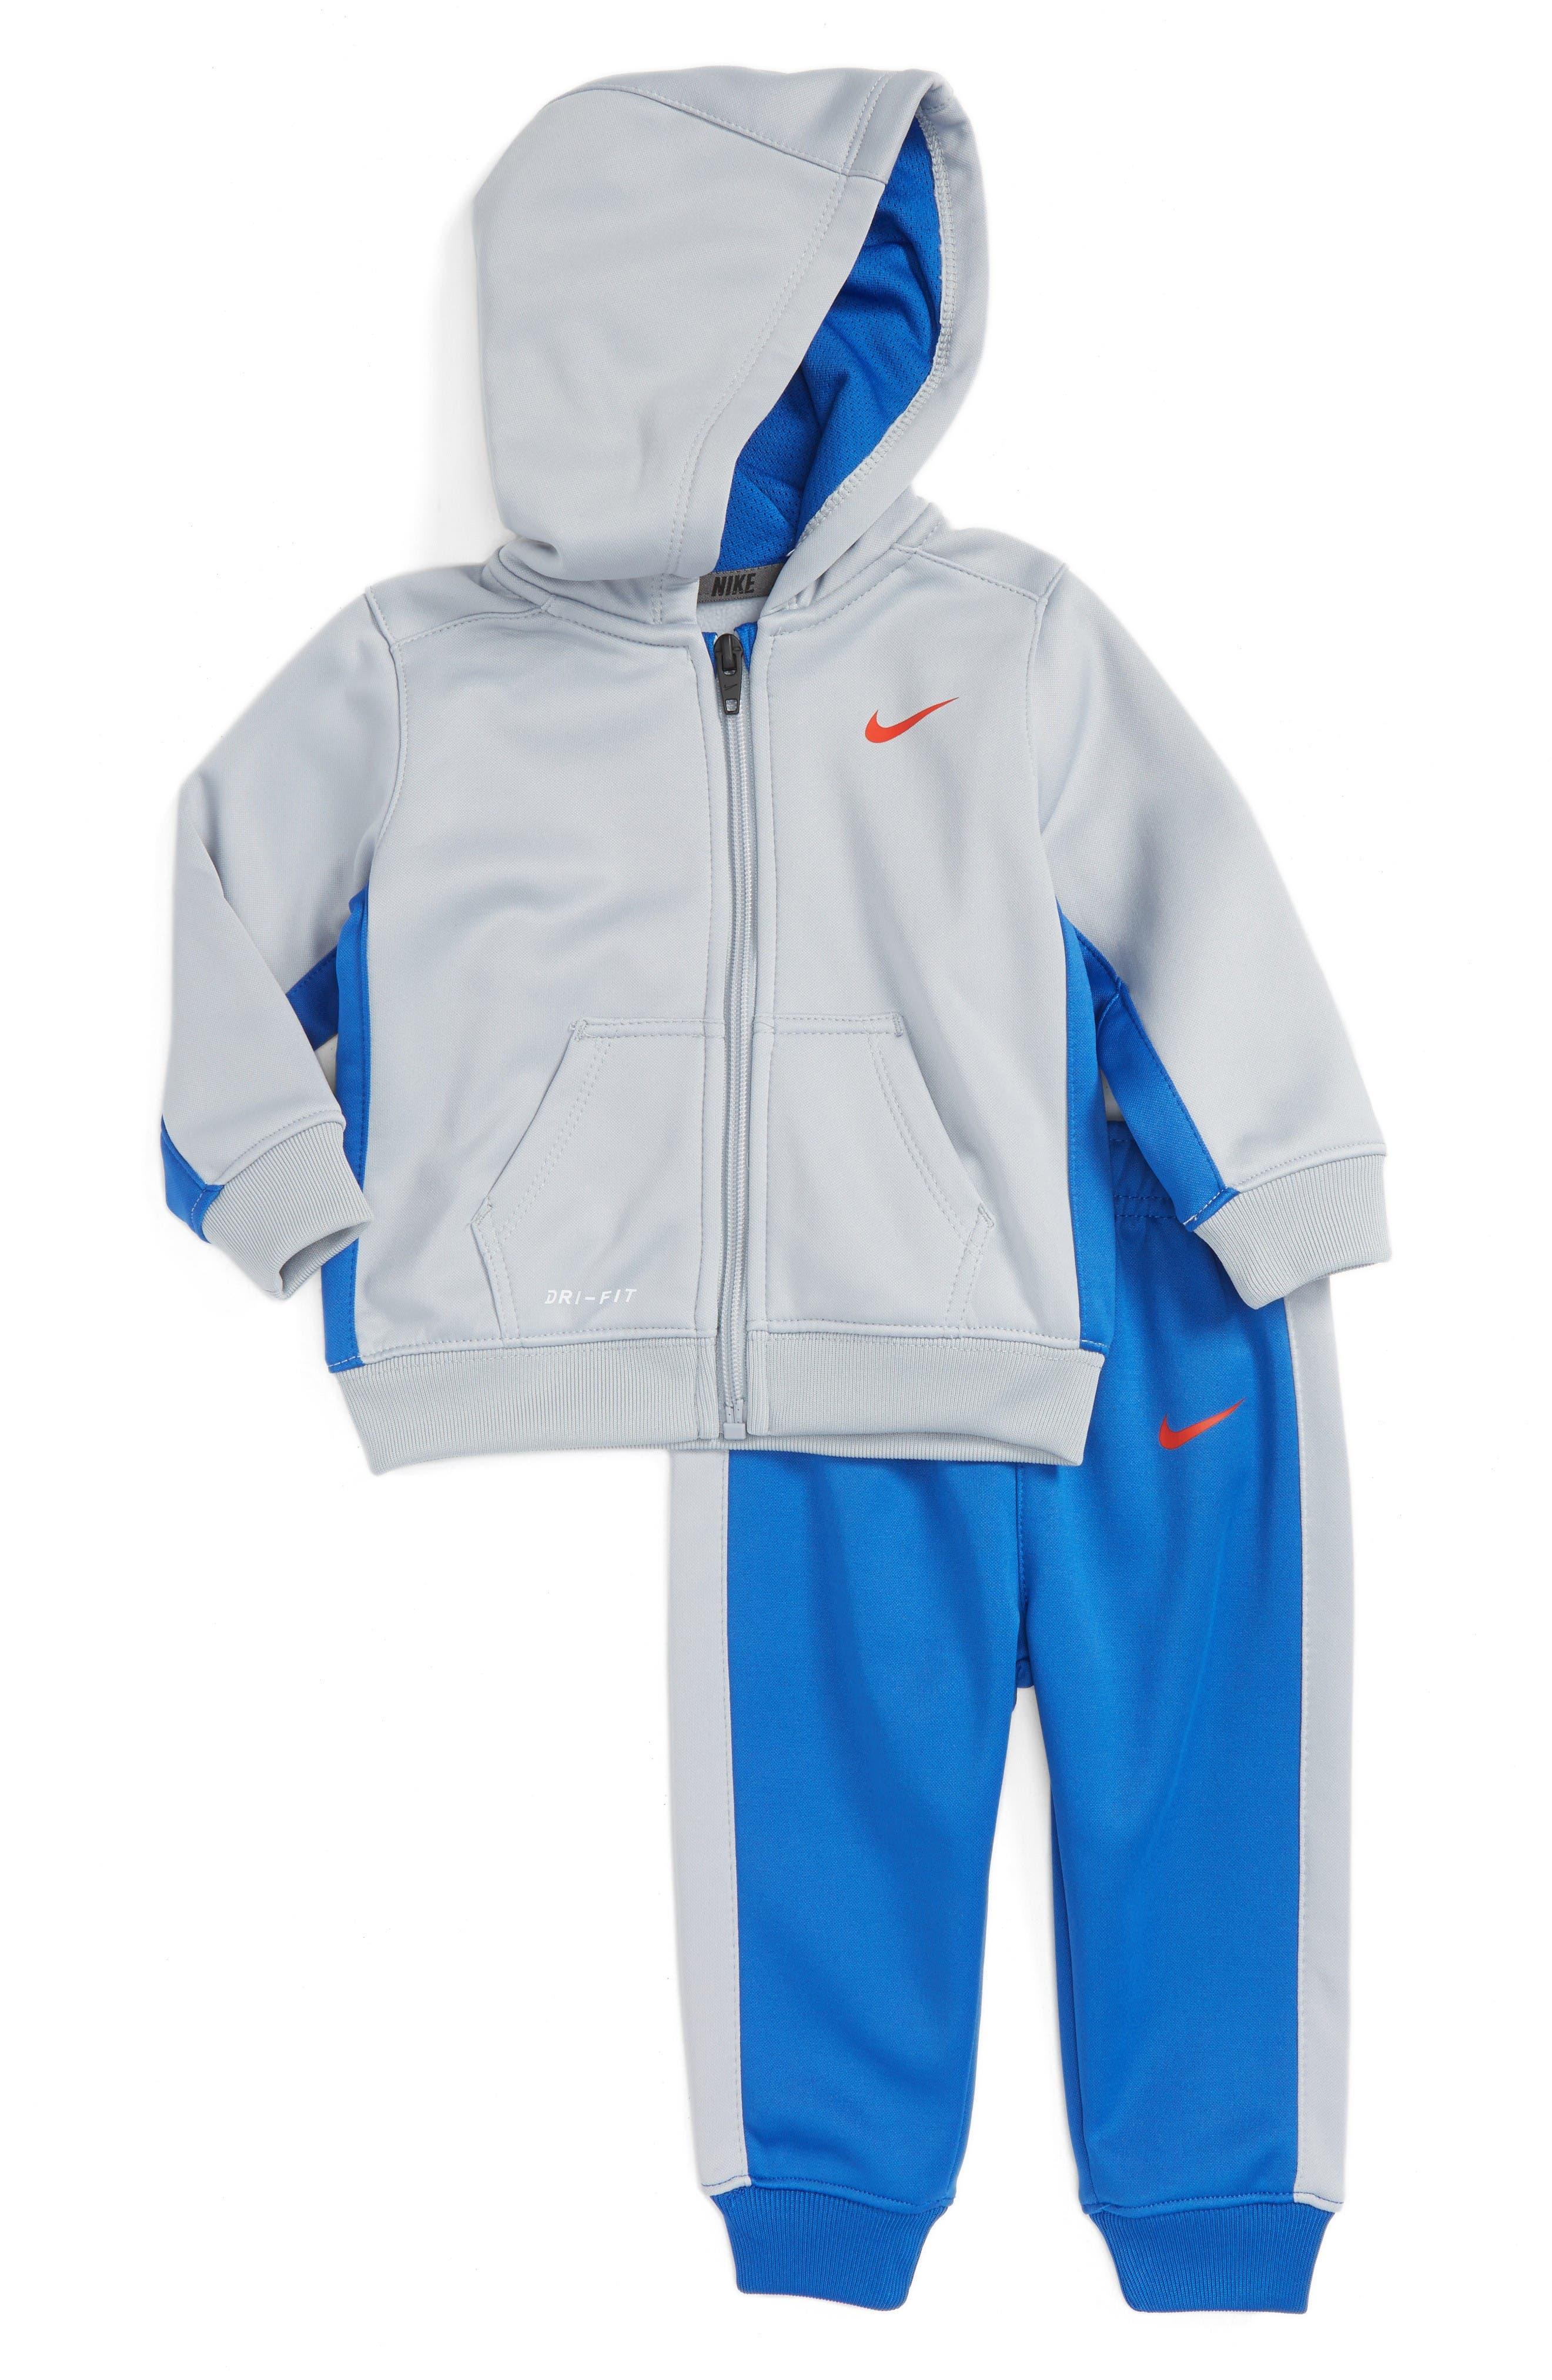 Main Image - Nike KO Therma-FIT Fleece Hoodie & Pants Set (Baby Boys)